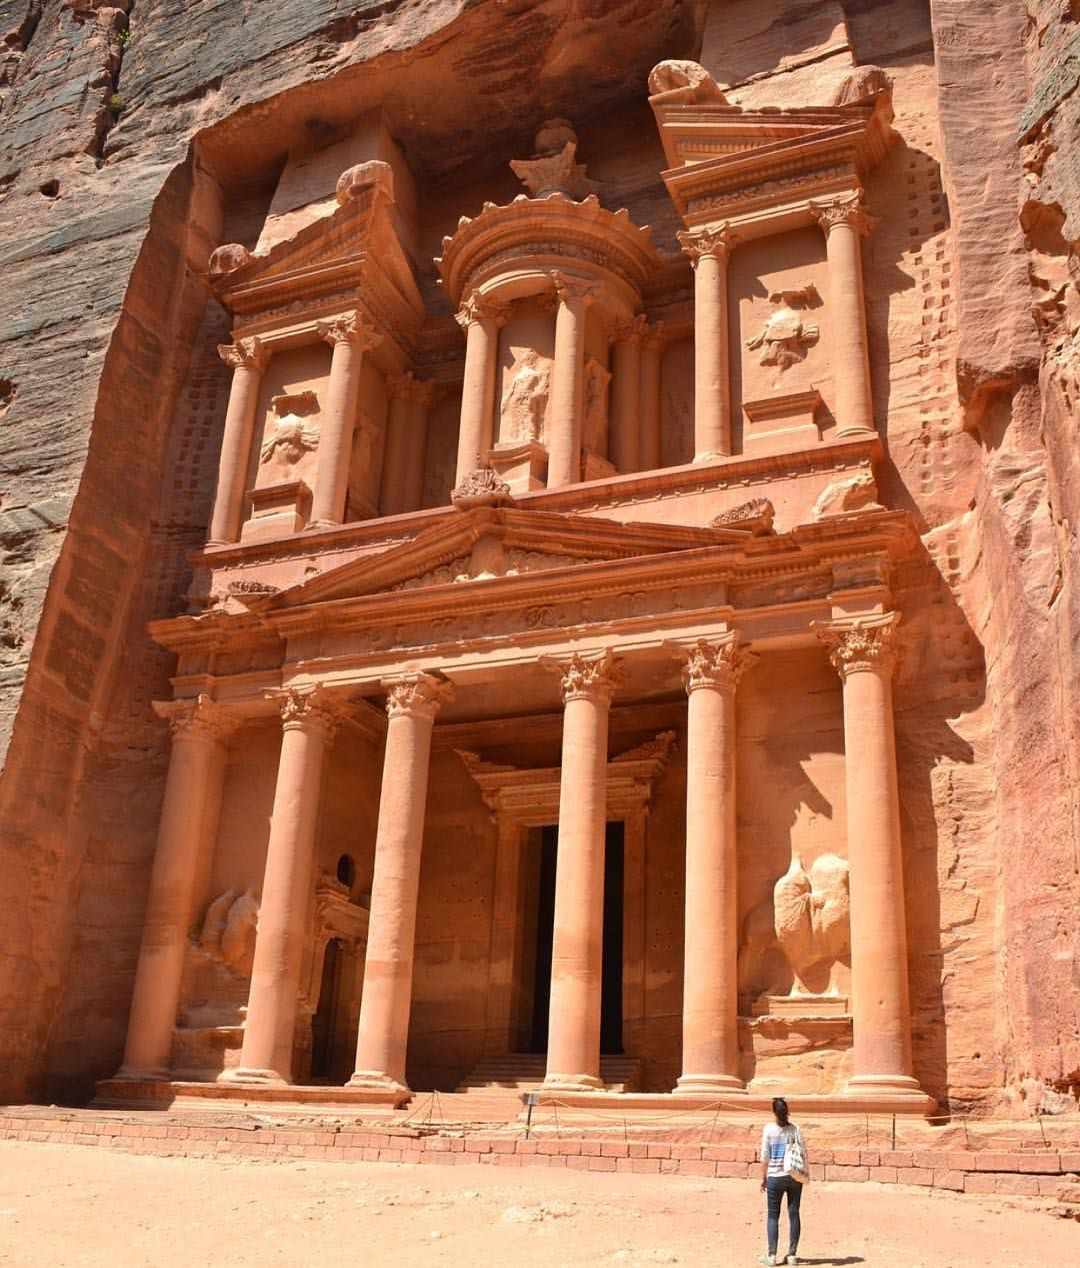 Beyondbabeesh Is Not Lost In Petra Jordan Sheisnotlost Http Ift Tt 2vdxhnt Middle Eastern Travel Jordan Travel Travel